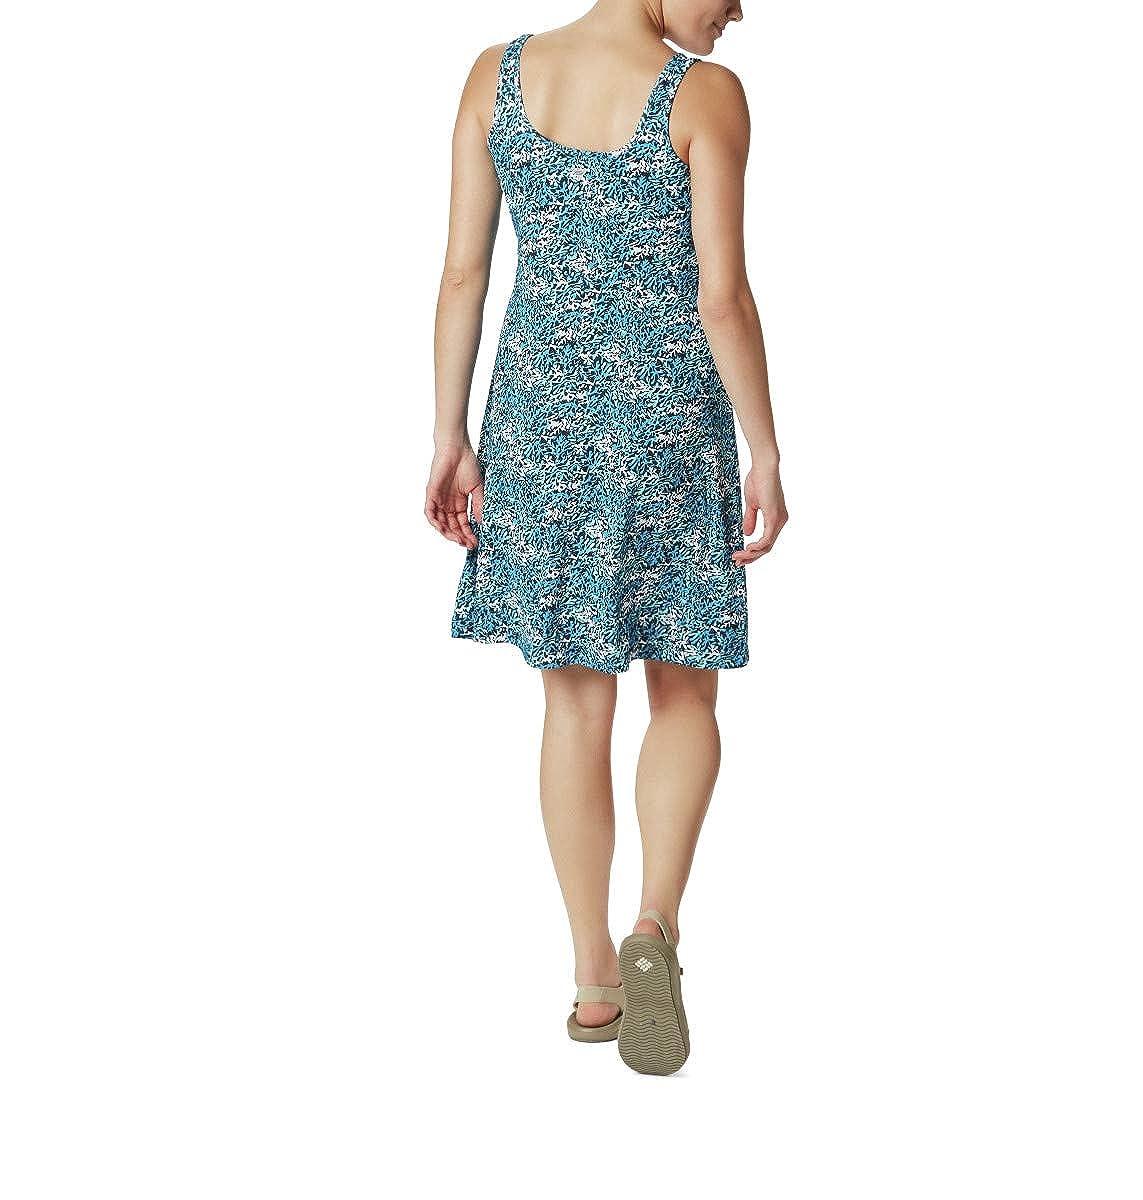 Columbia Womens Freezer Iii Dress